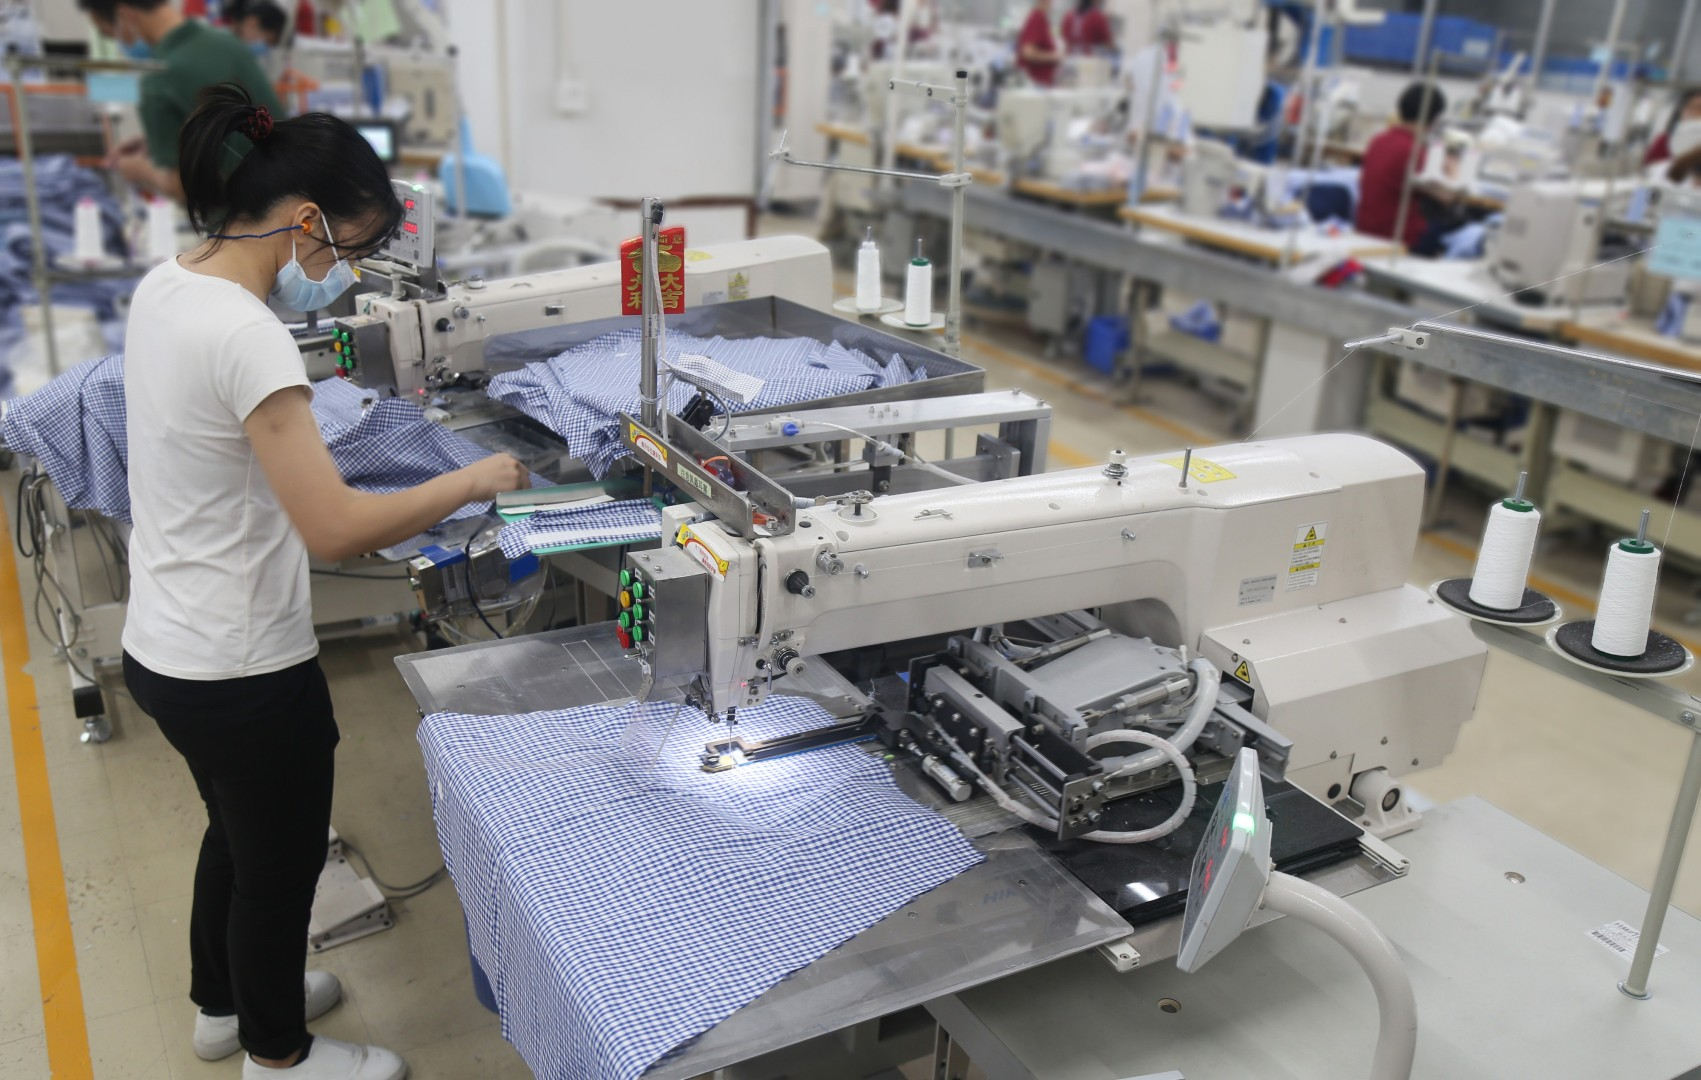 Hong Kong shirtmaker Esquel turns to robots to beat tariffs   South